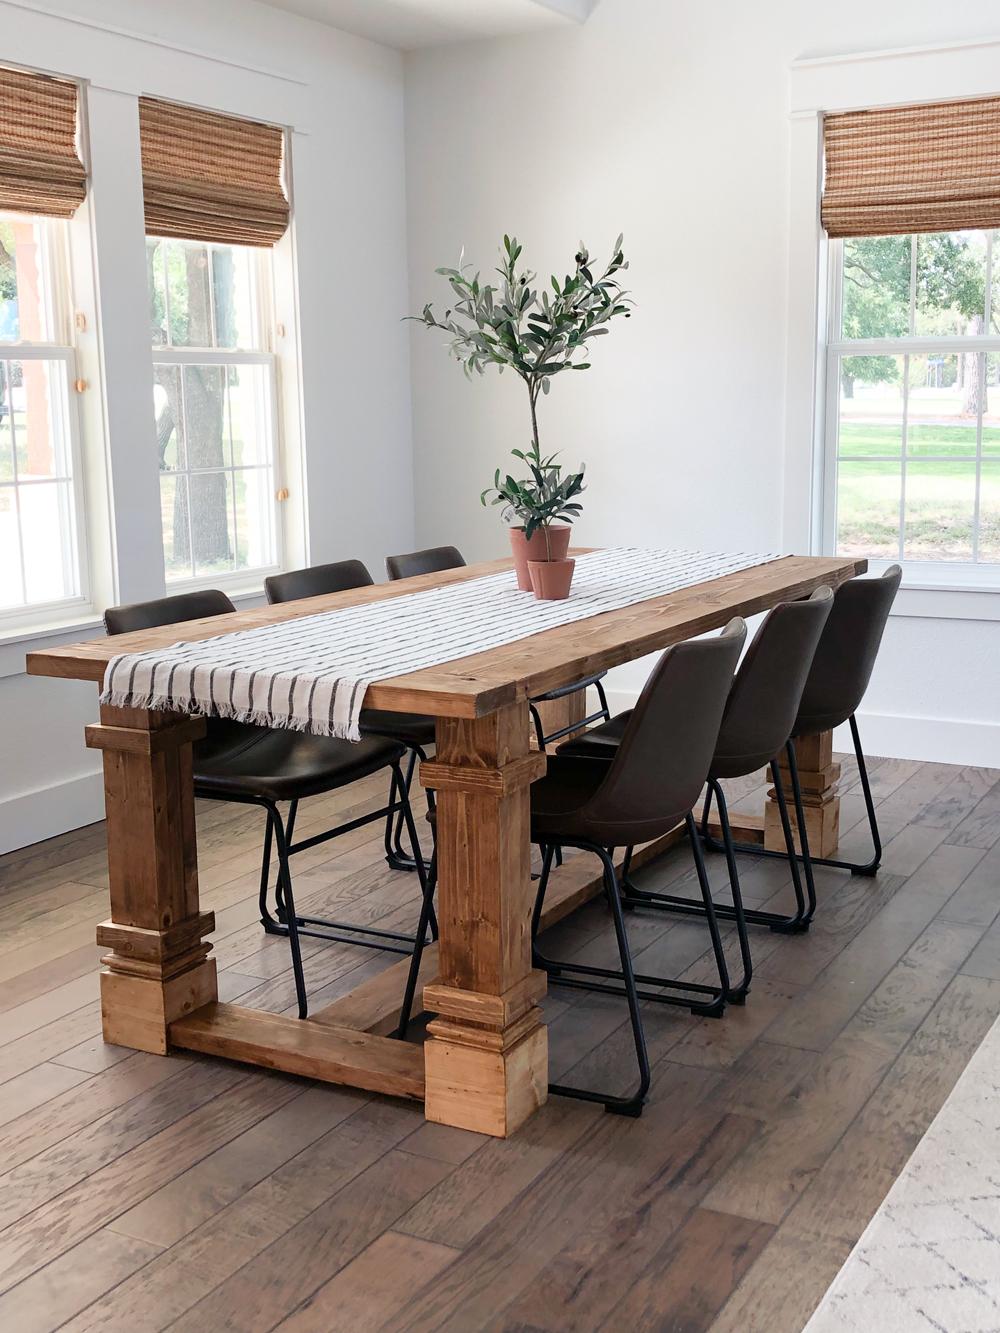 Diy Modern Farmhouse Dining Table For The Flip House Shanty 2 Chic